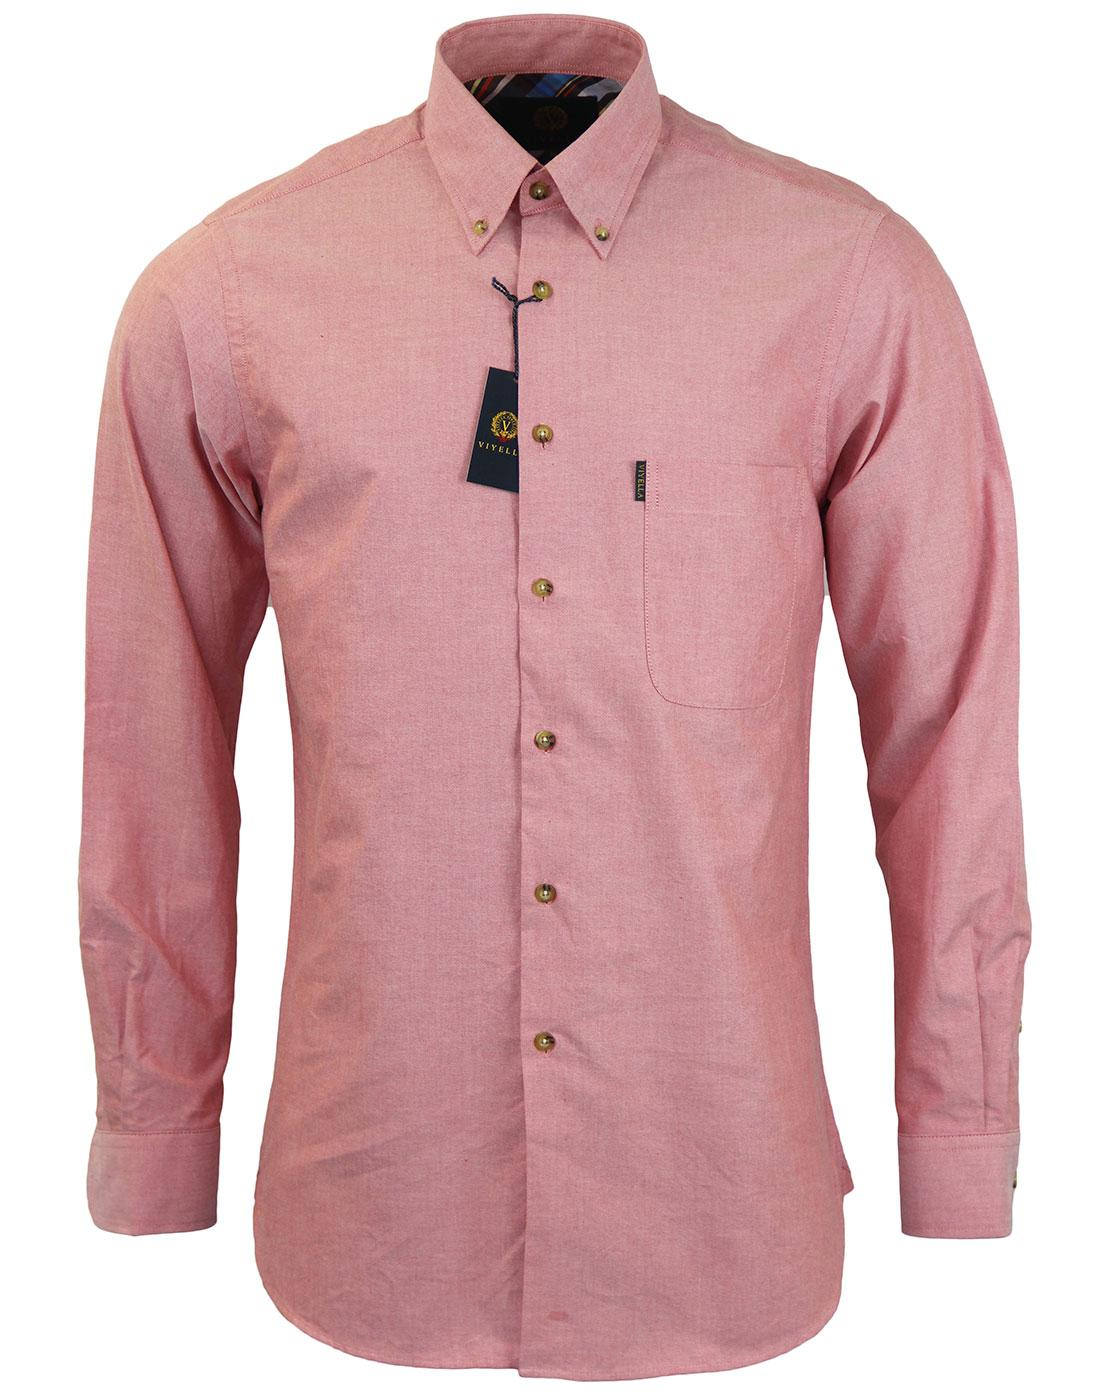 VIYELLA Retro Mod Button Down Oxford Shirt RED